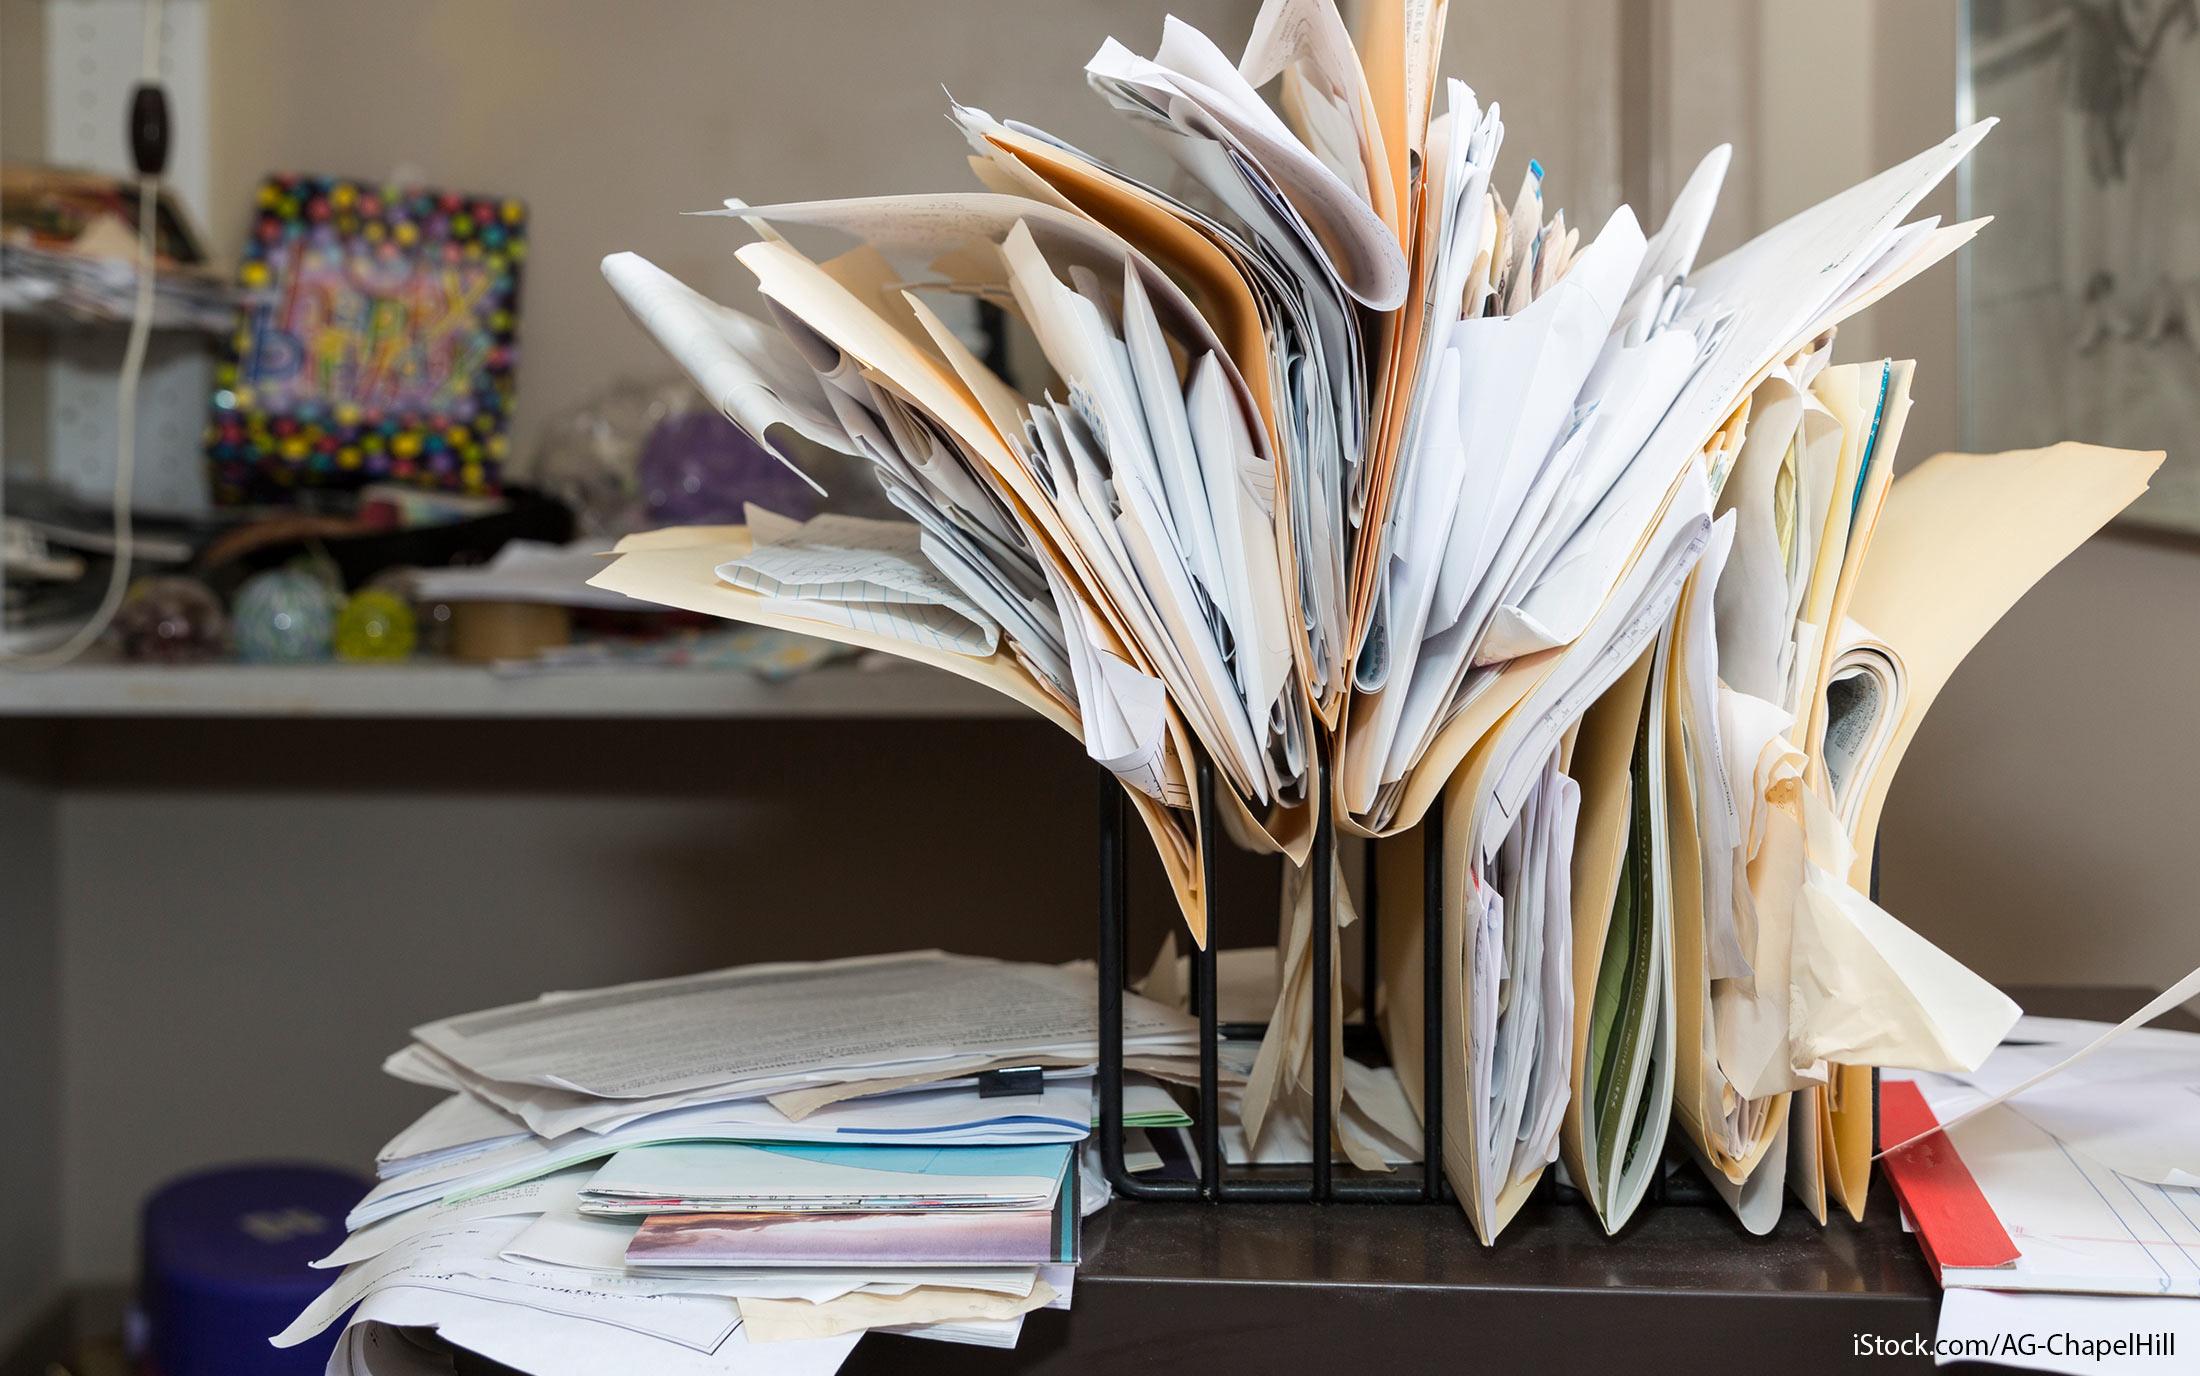 clutter cost money